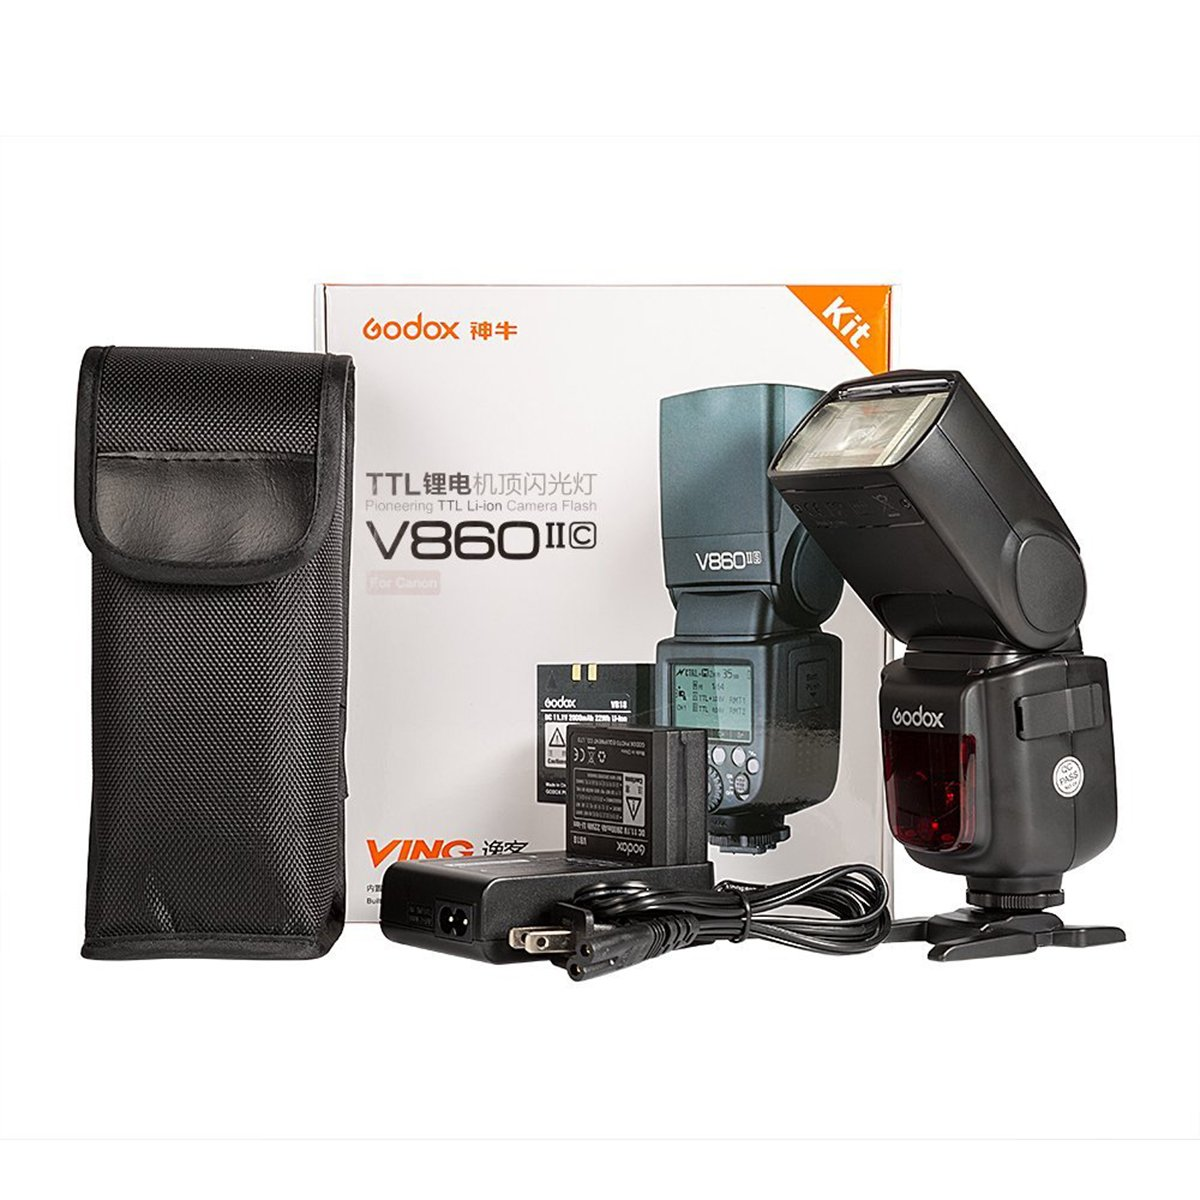 Godox V860II-C 2.4G GN60 TTL HSS 1/8000s High Power Lithium Battery Slave/Master Speedlite for Canon 6D 7D 50D 60D 1DX 600D 600EX-RT 580EX II 5D Mark II III